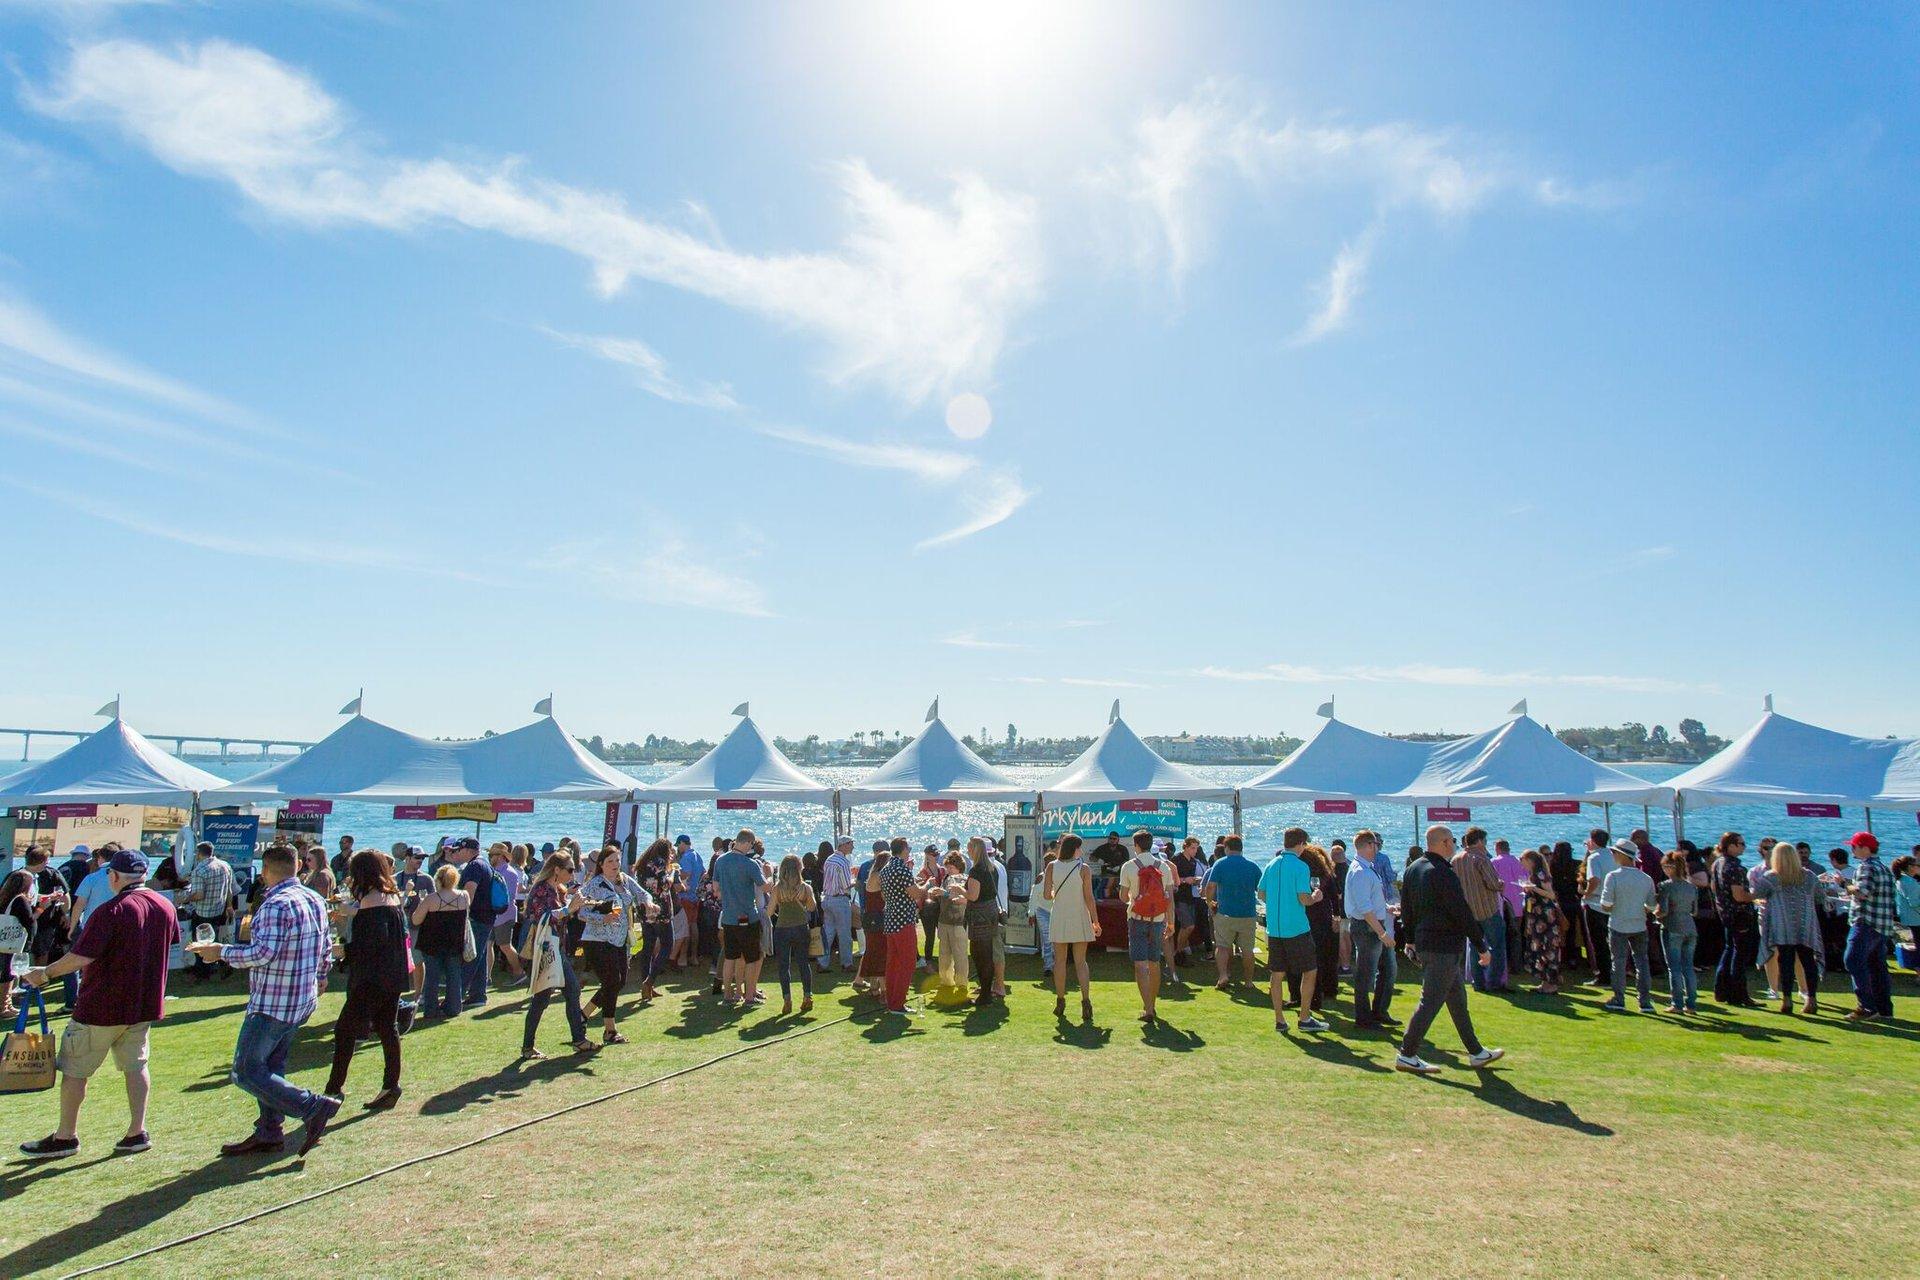 San Diego Bay Wine + Food Festival in San Diego - Best Time